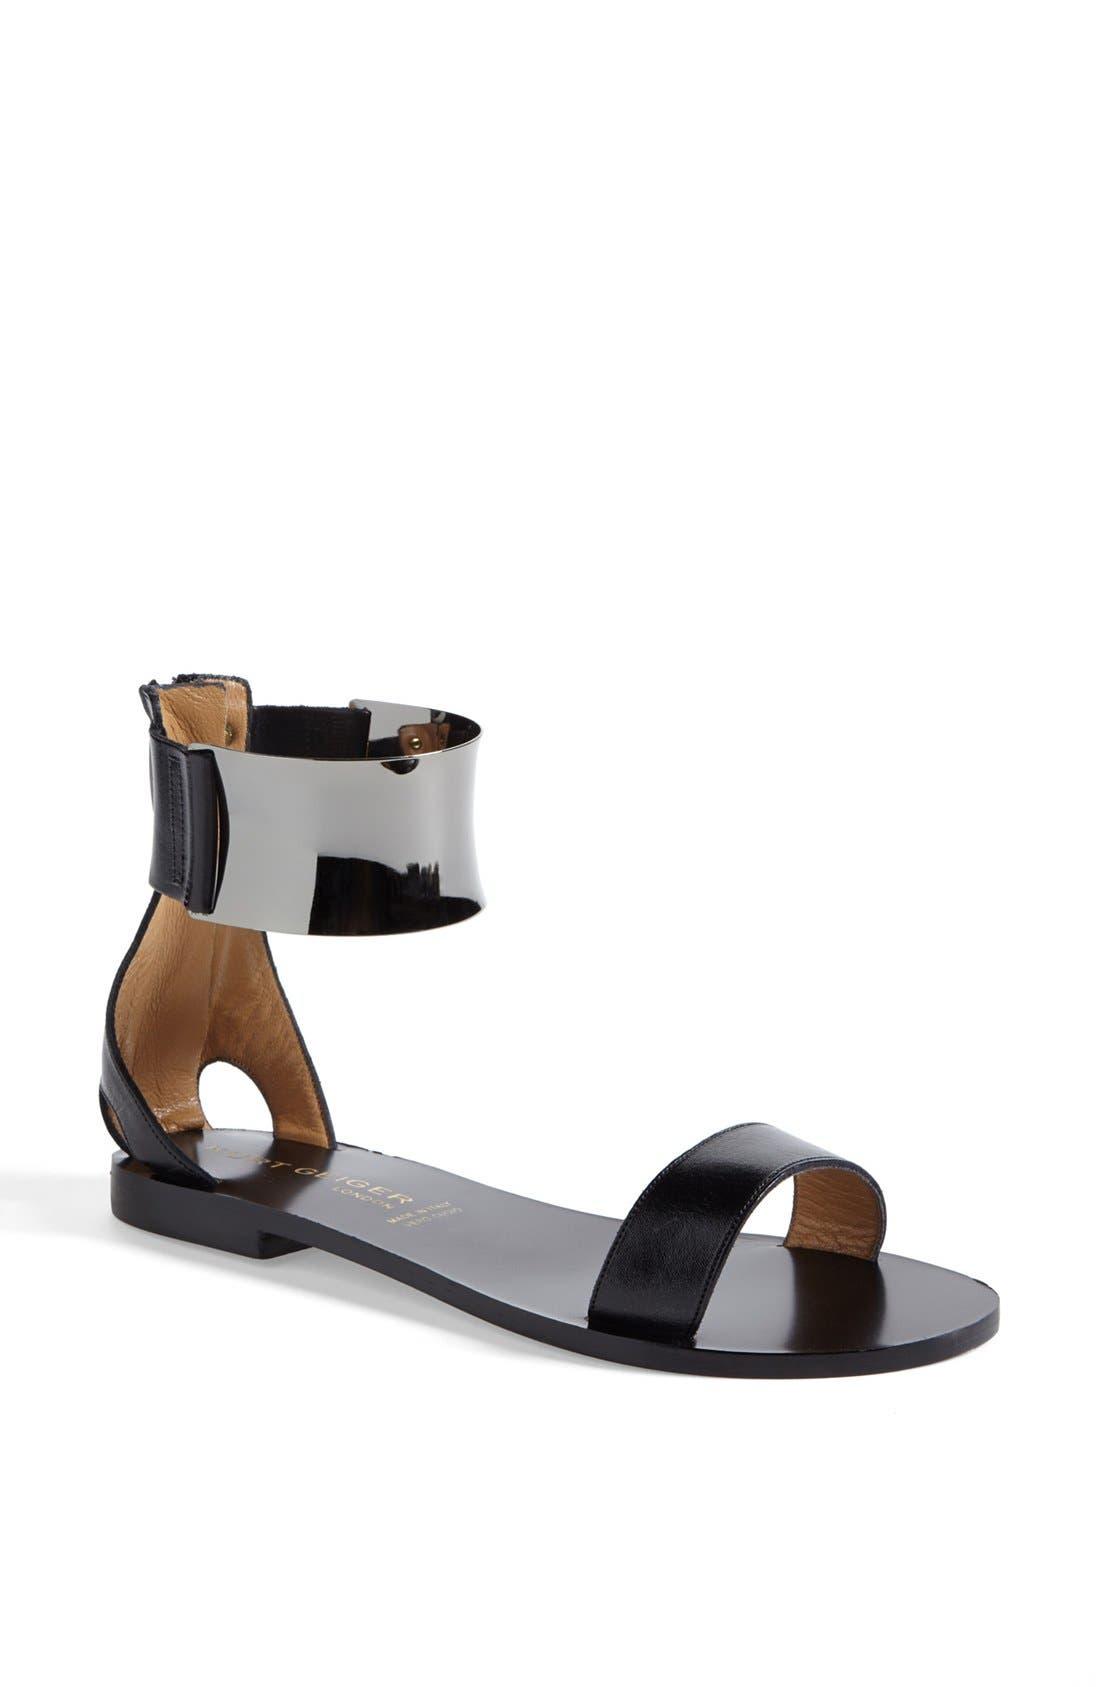 Alternate Image 1 Selected - Kurt Geiger London 'Lux' Sandal (Online Only)